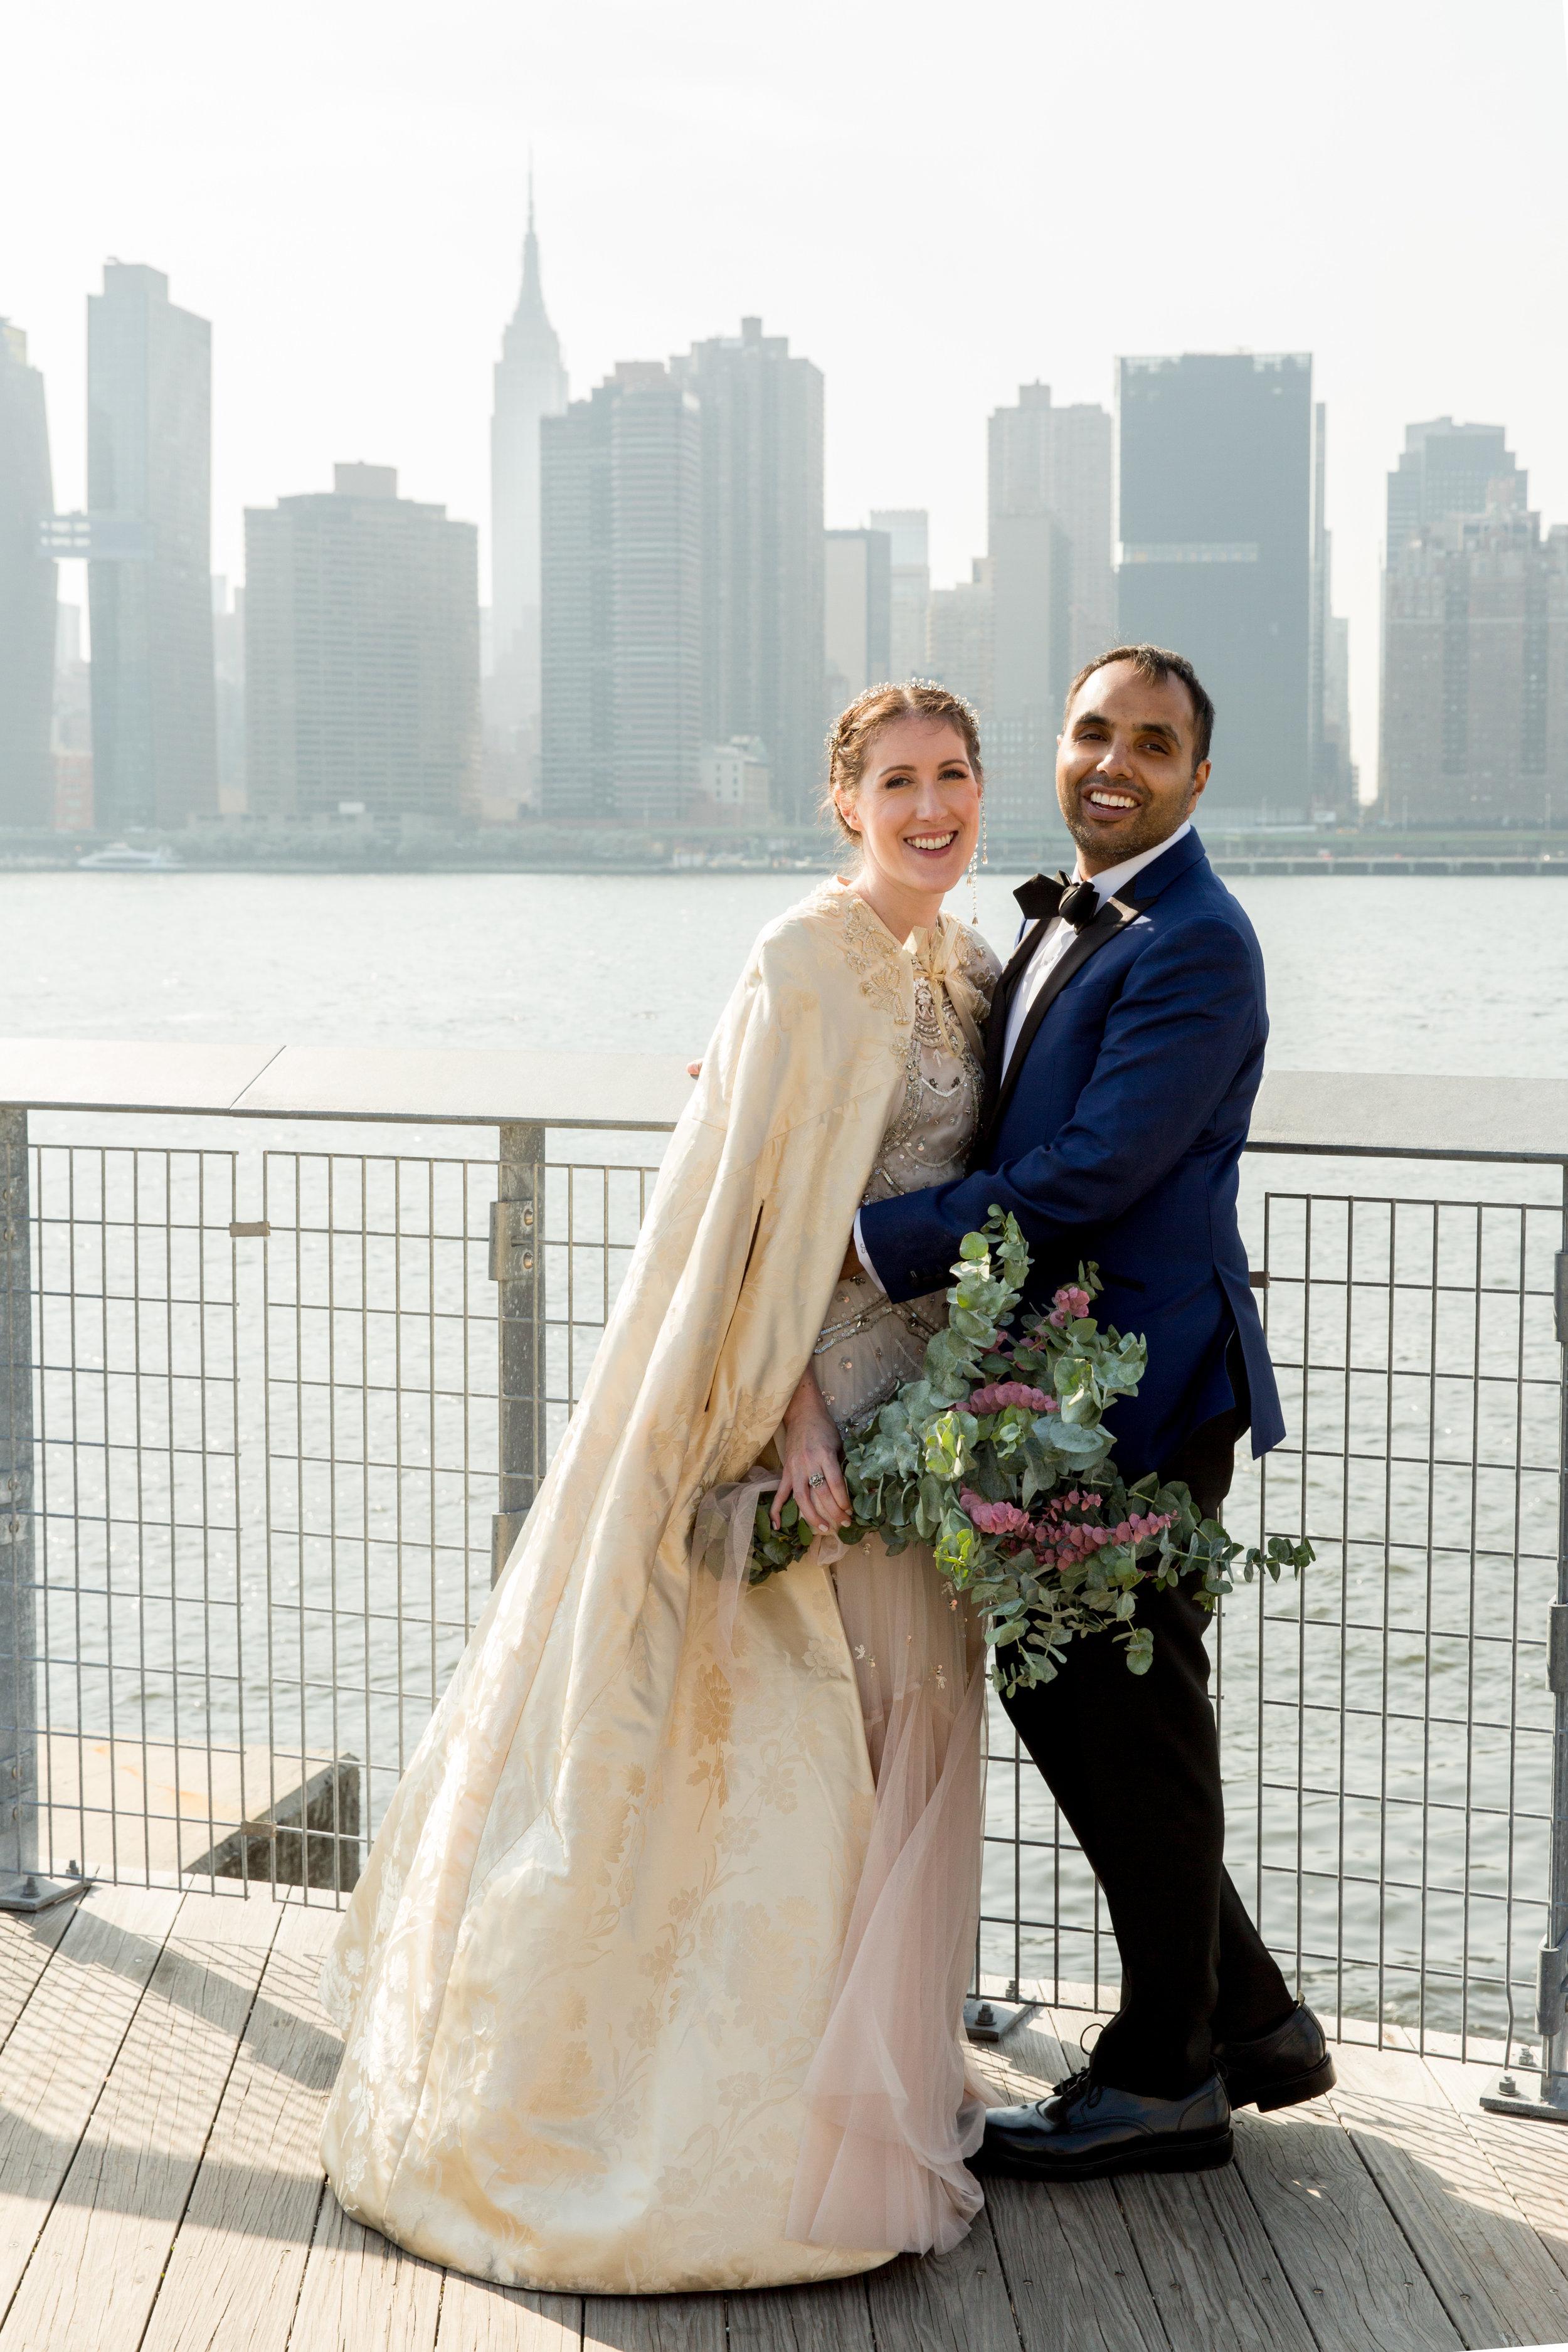 Annie+Jay Wedding Teasers-20.jpg